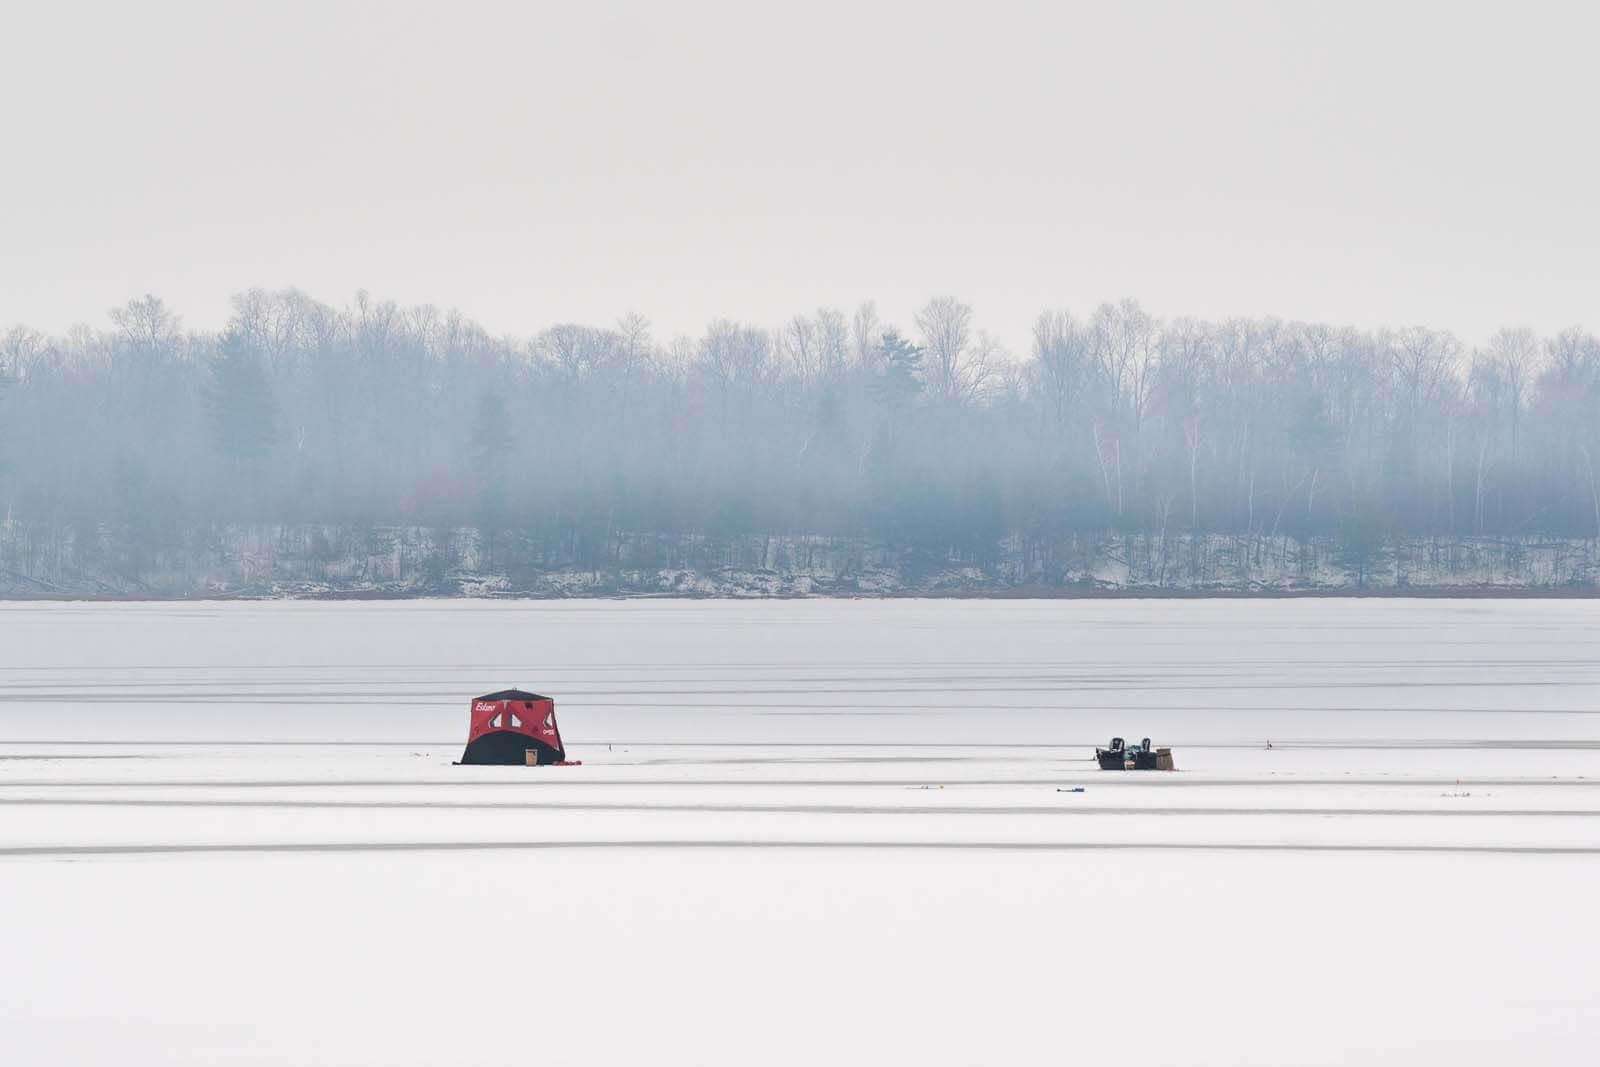 Ice fishing on Lake Champlain in Upstate New York